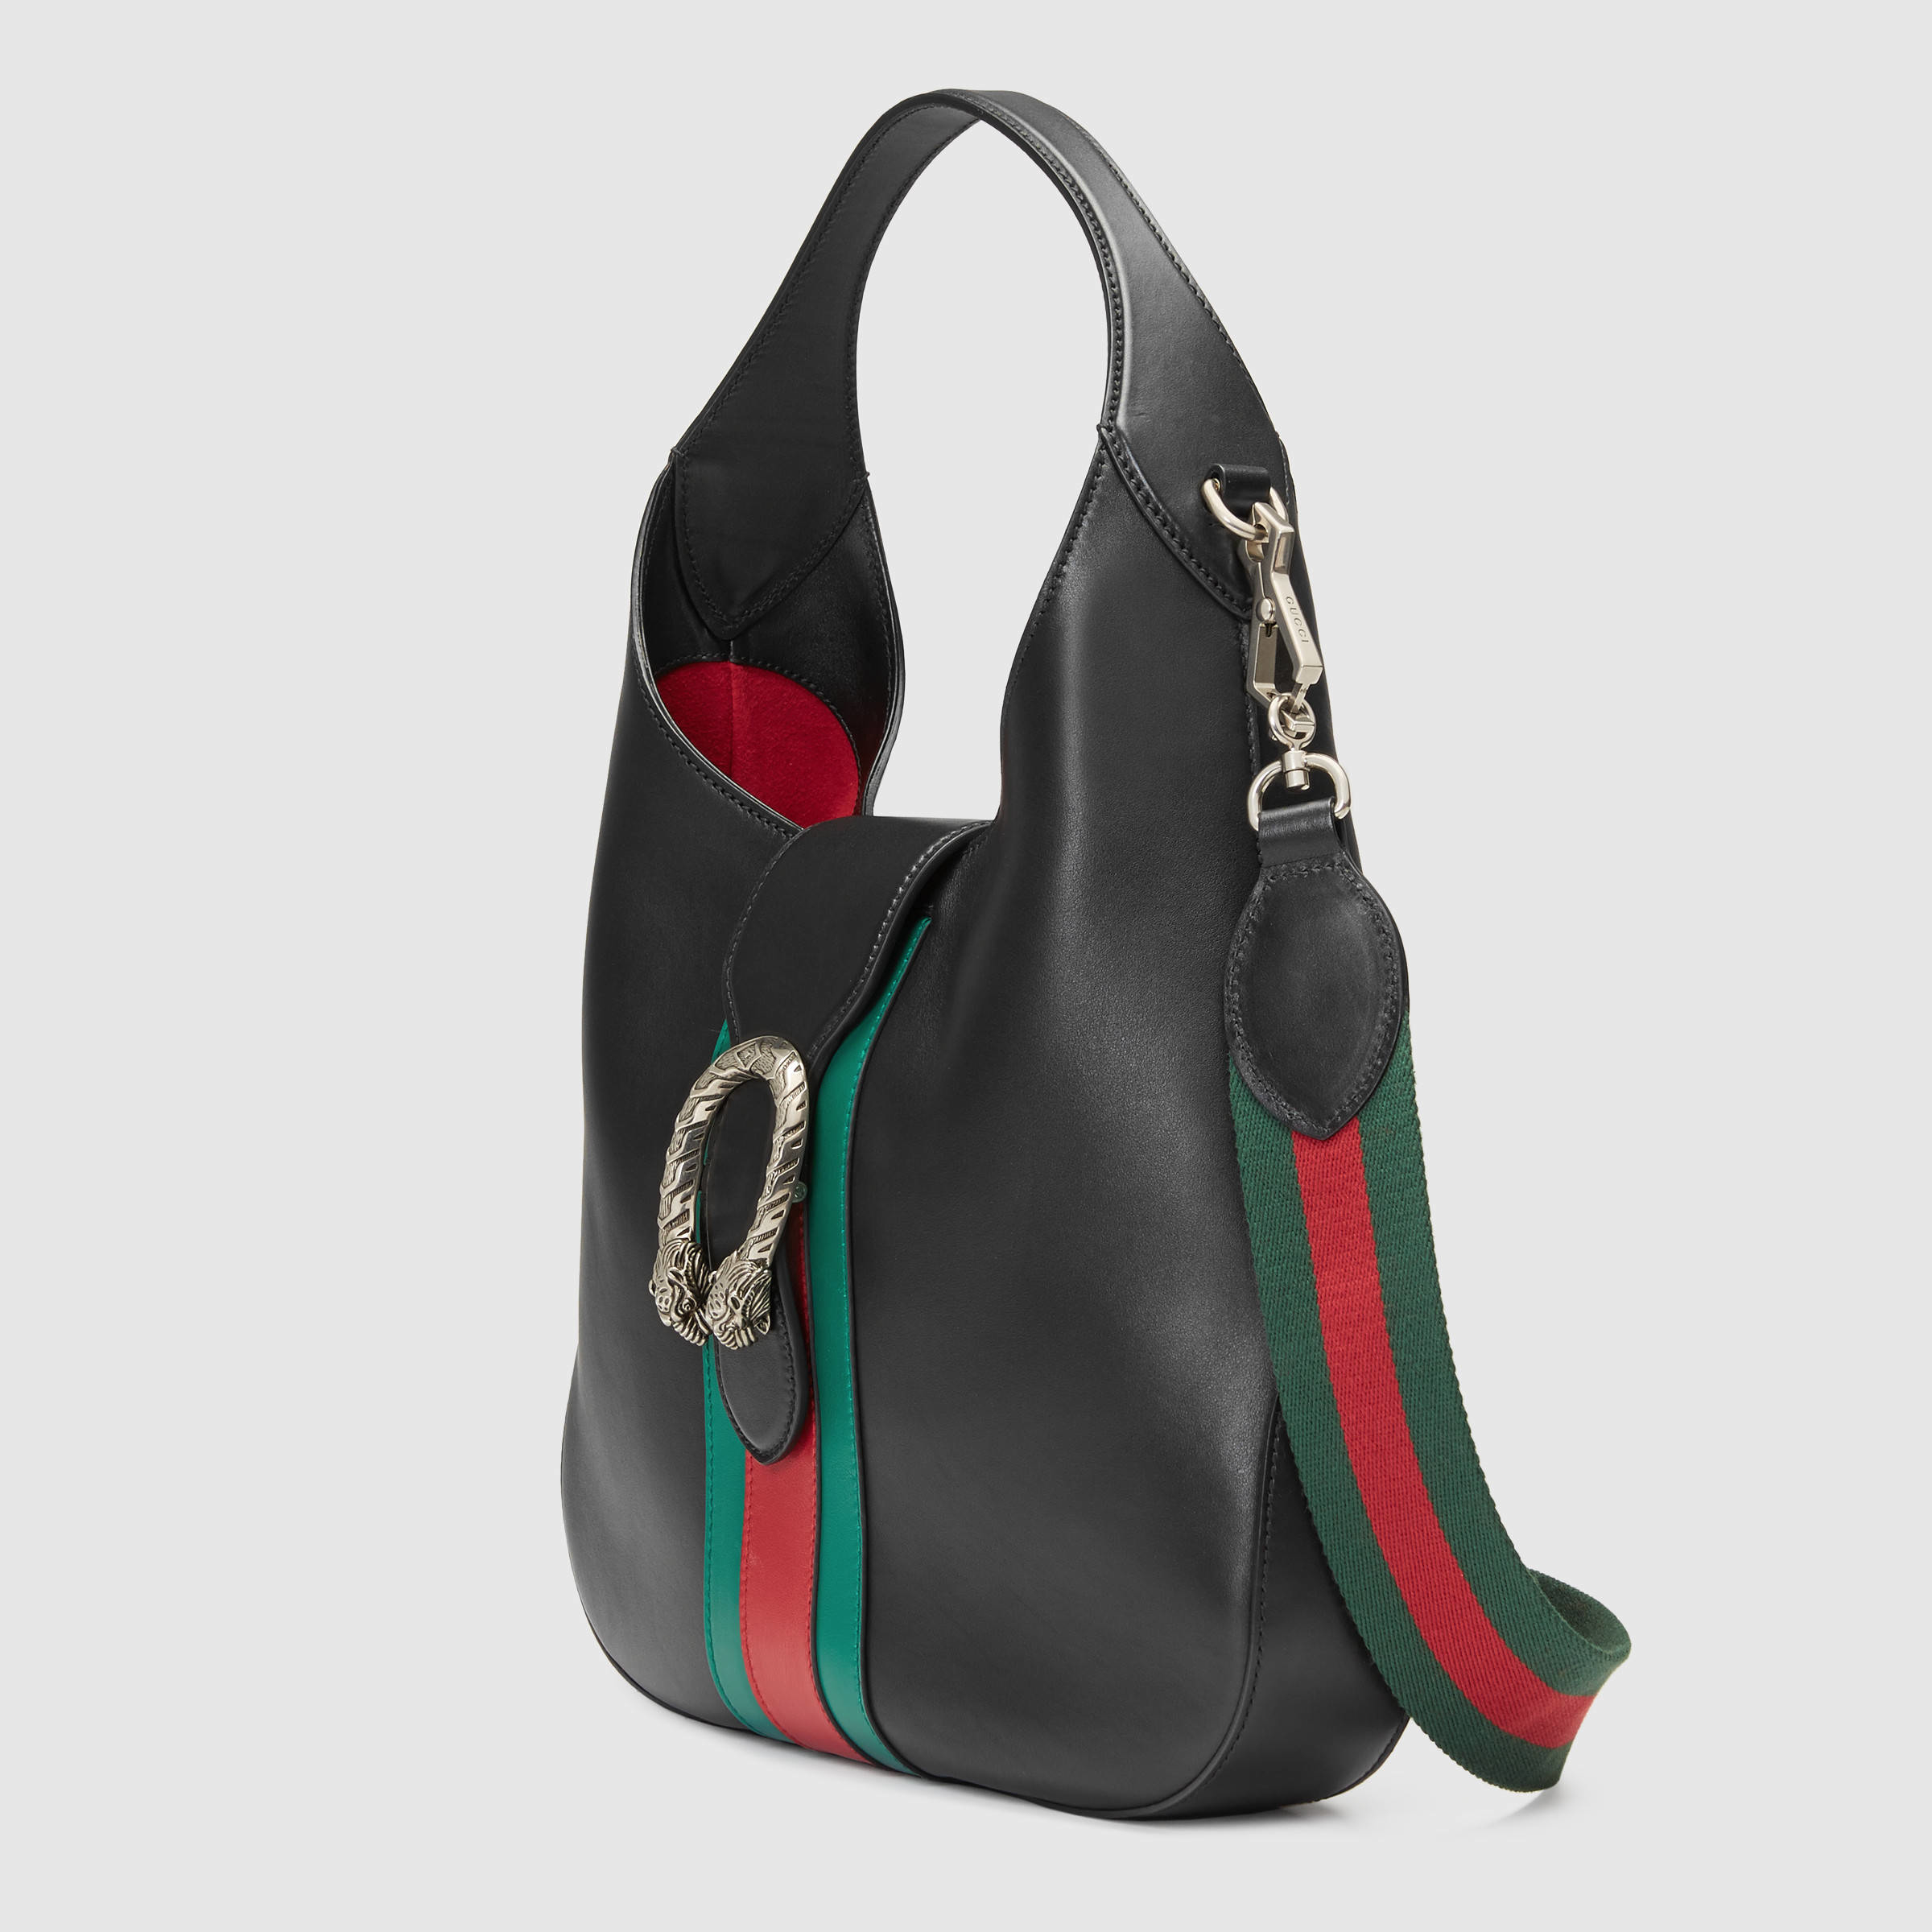 5c9c95e5329070 Gucci Dionysus Medium Web-stripe Hobo Bag in Black - Lyst